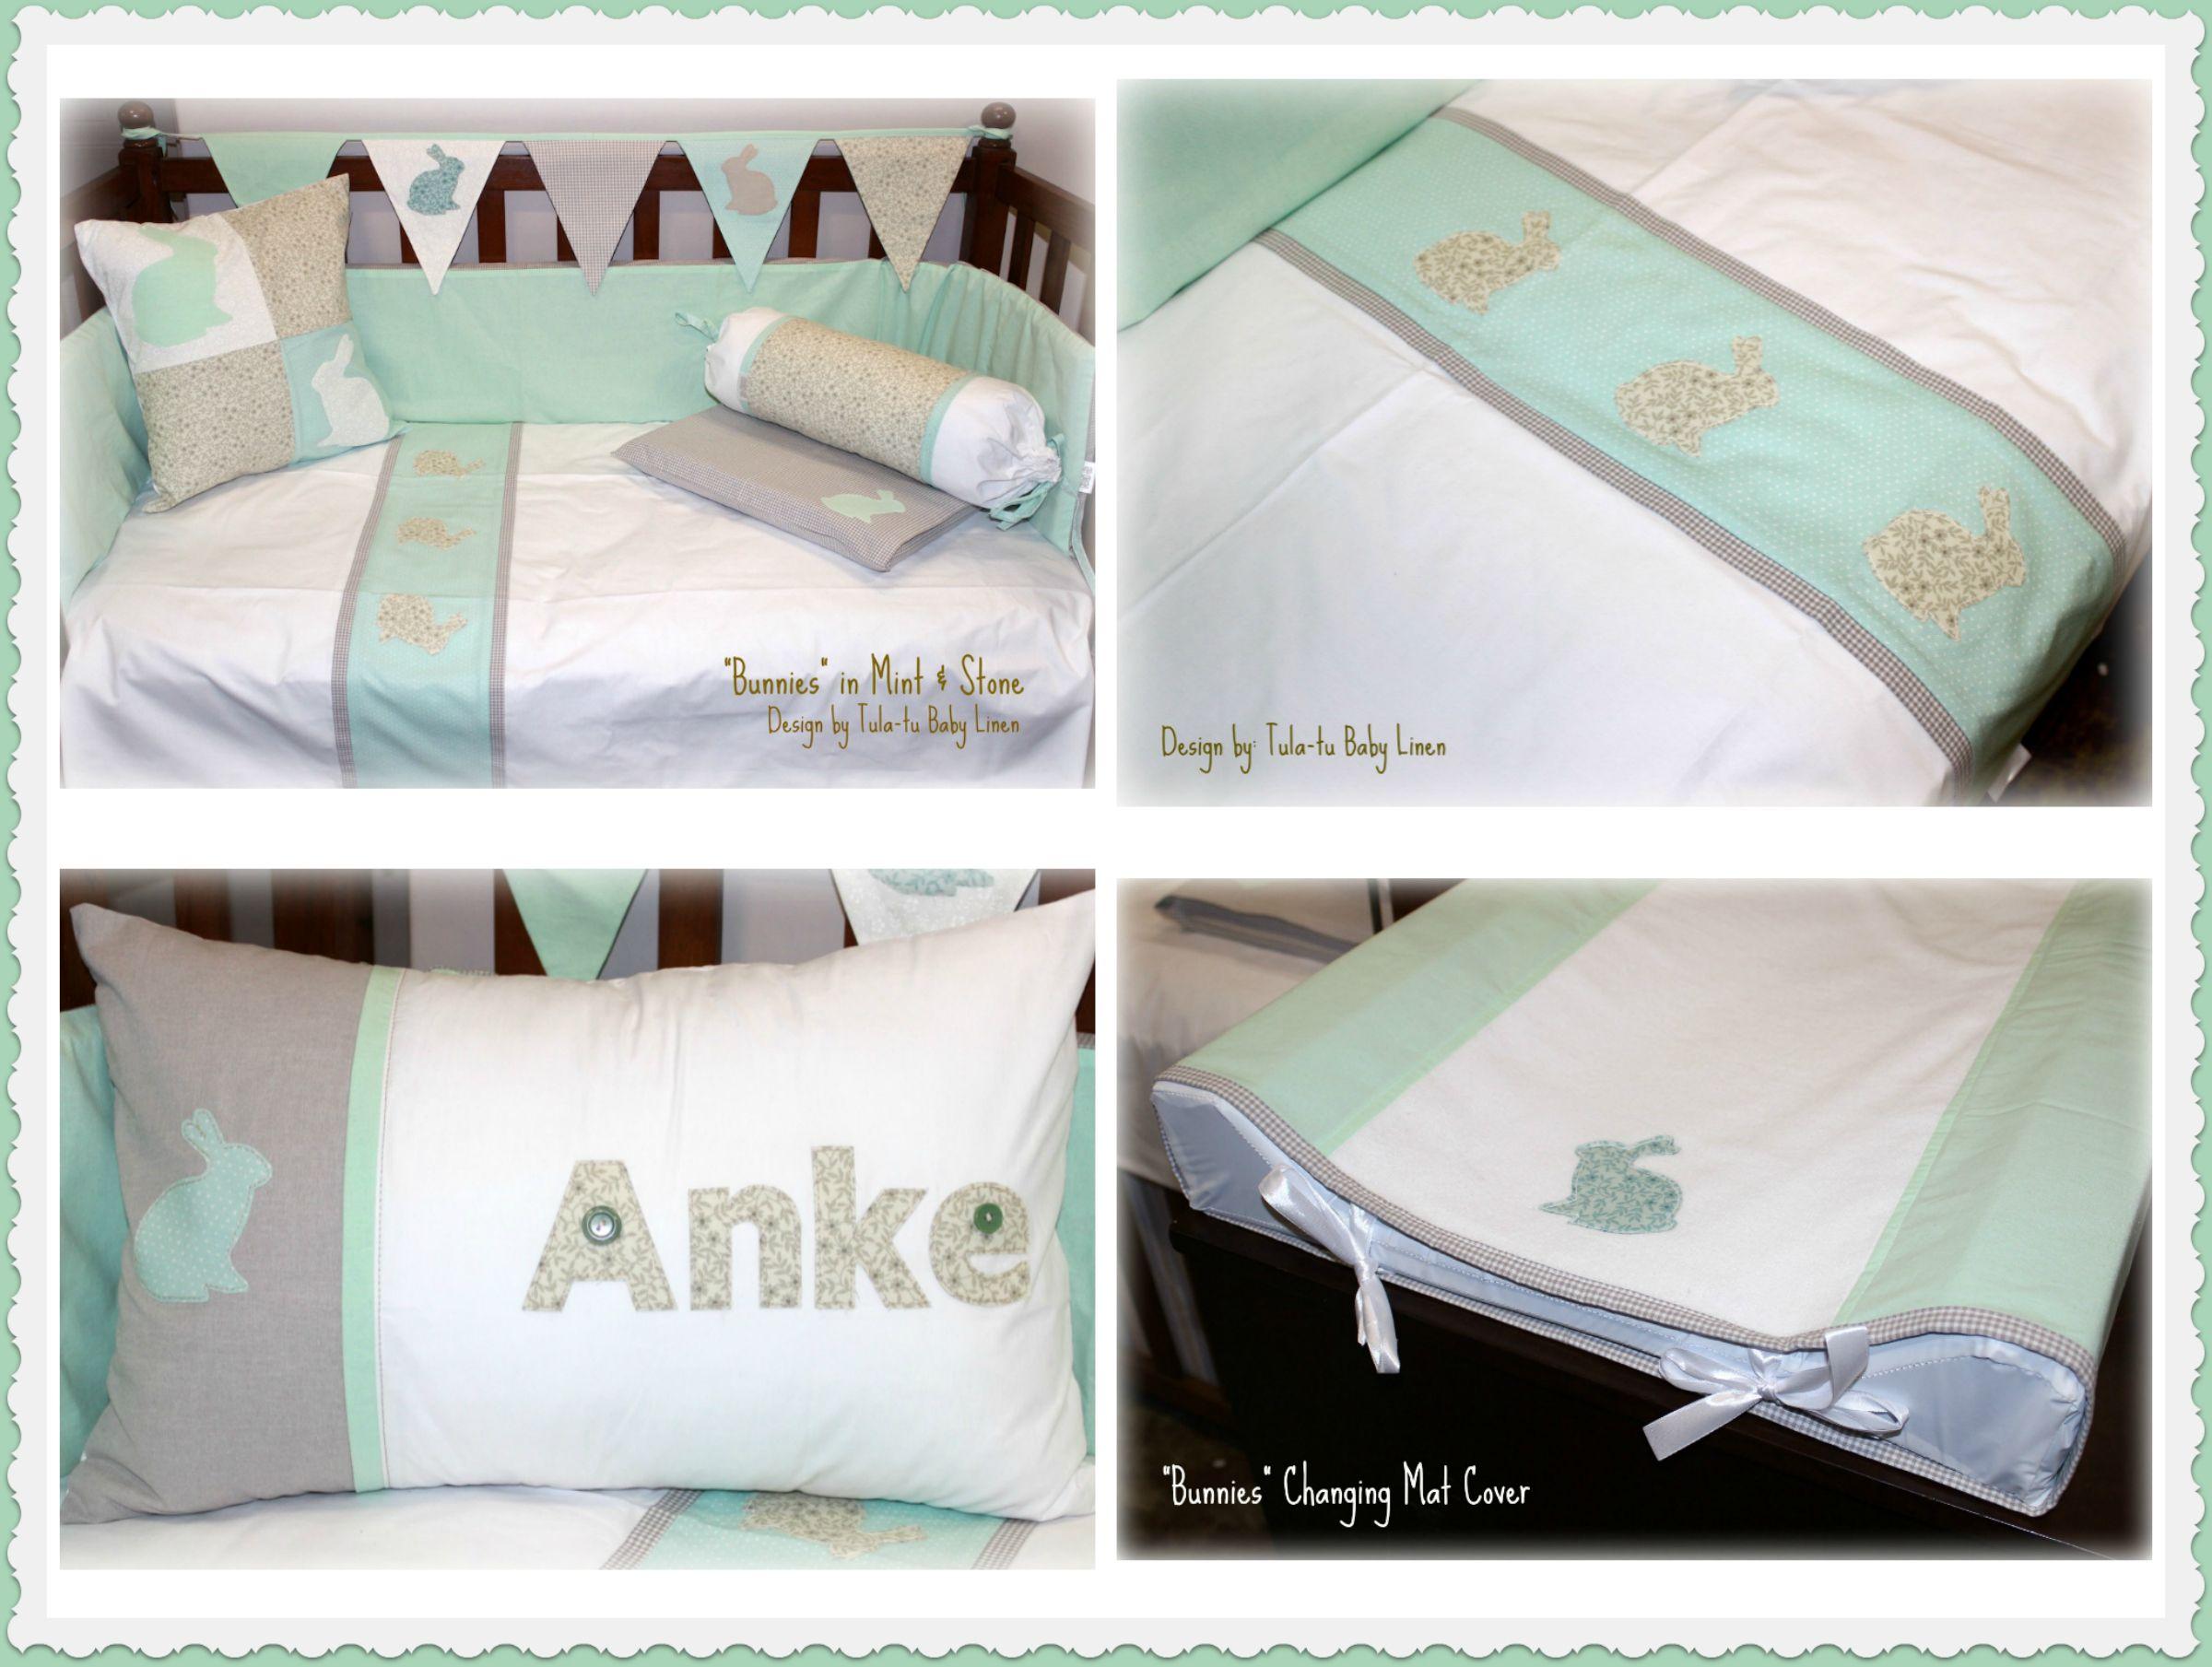 Baby cribs co za - Bunny Cot Nursery Linen In White Stone Mint Designed By Tula Tu